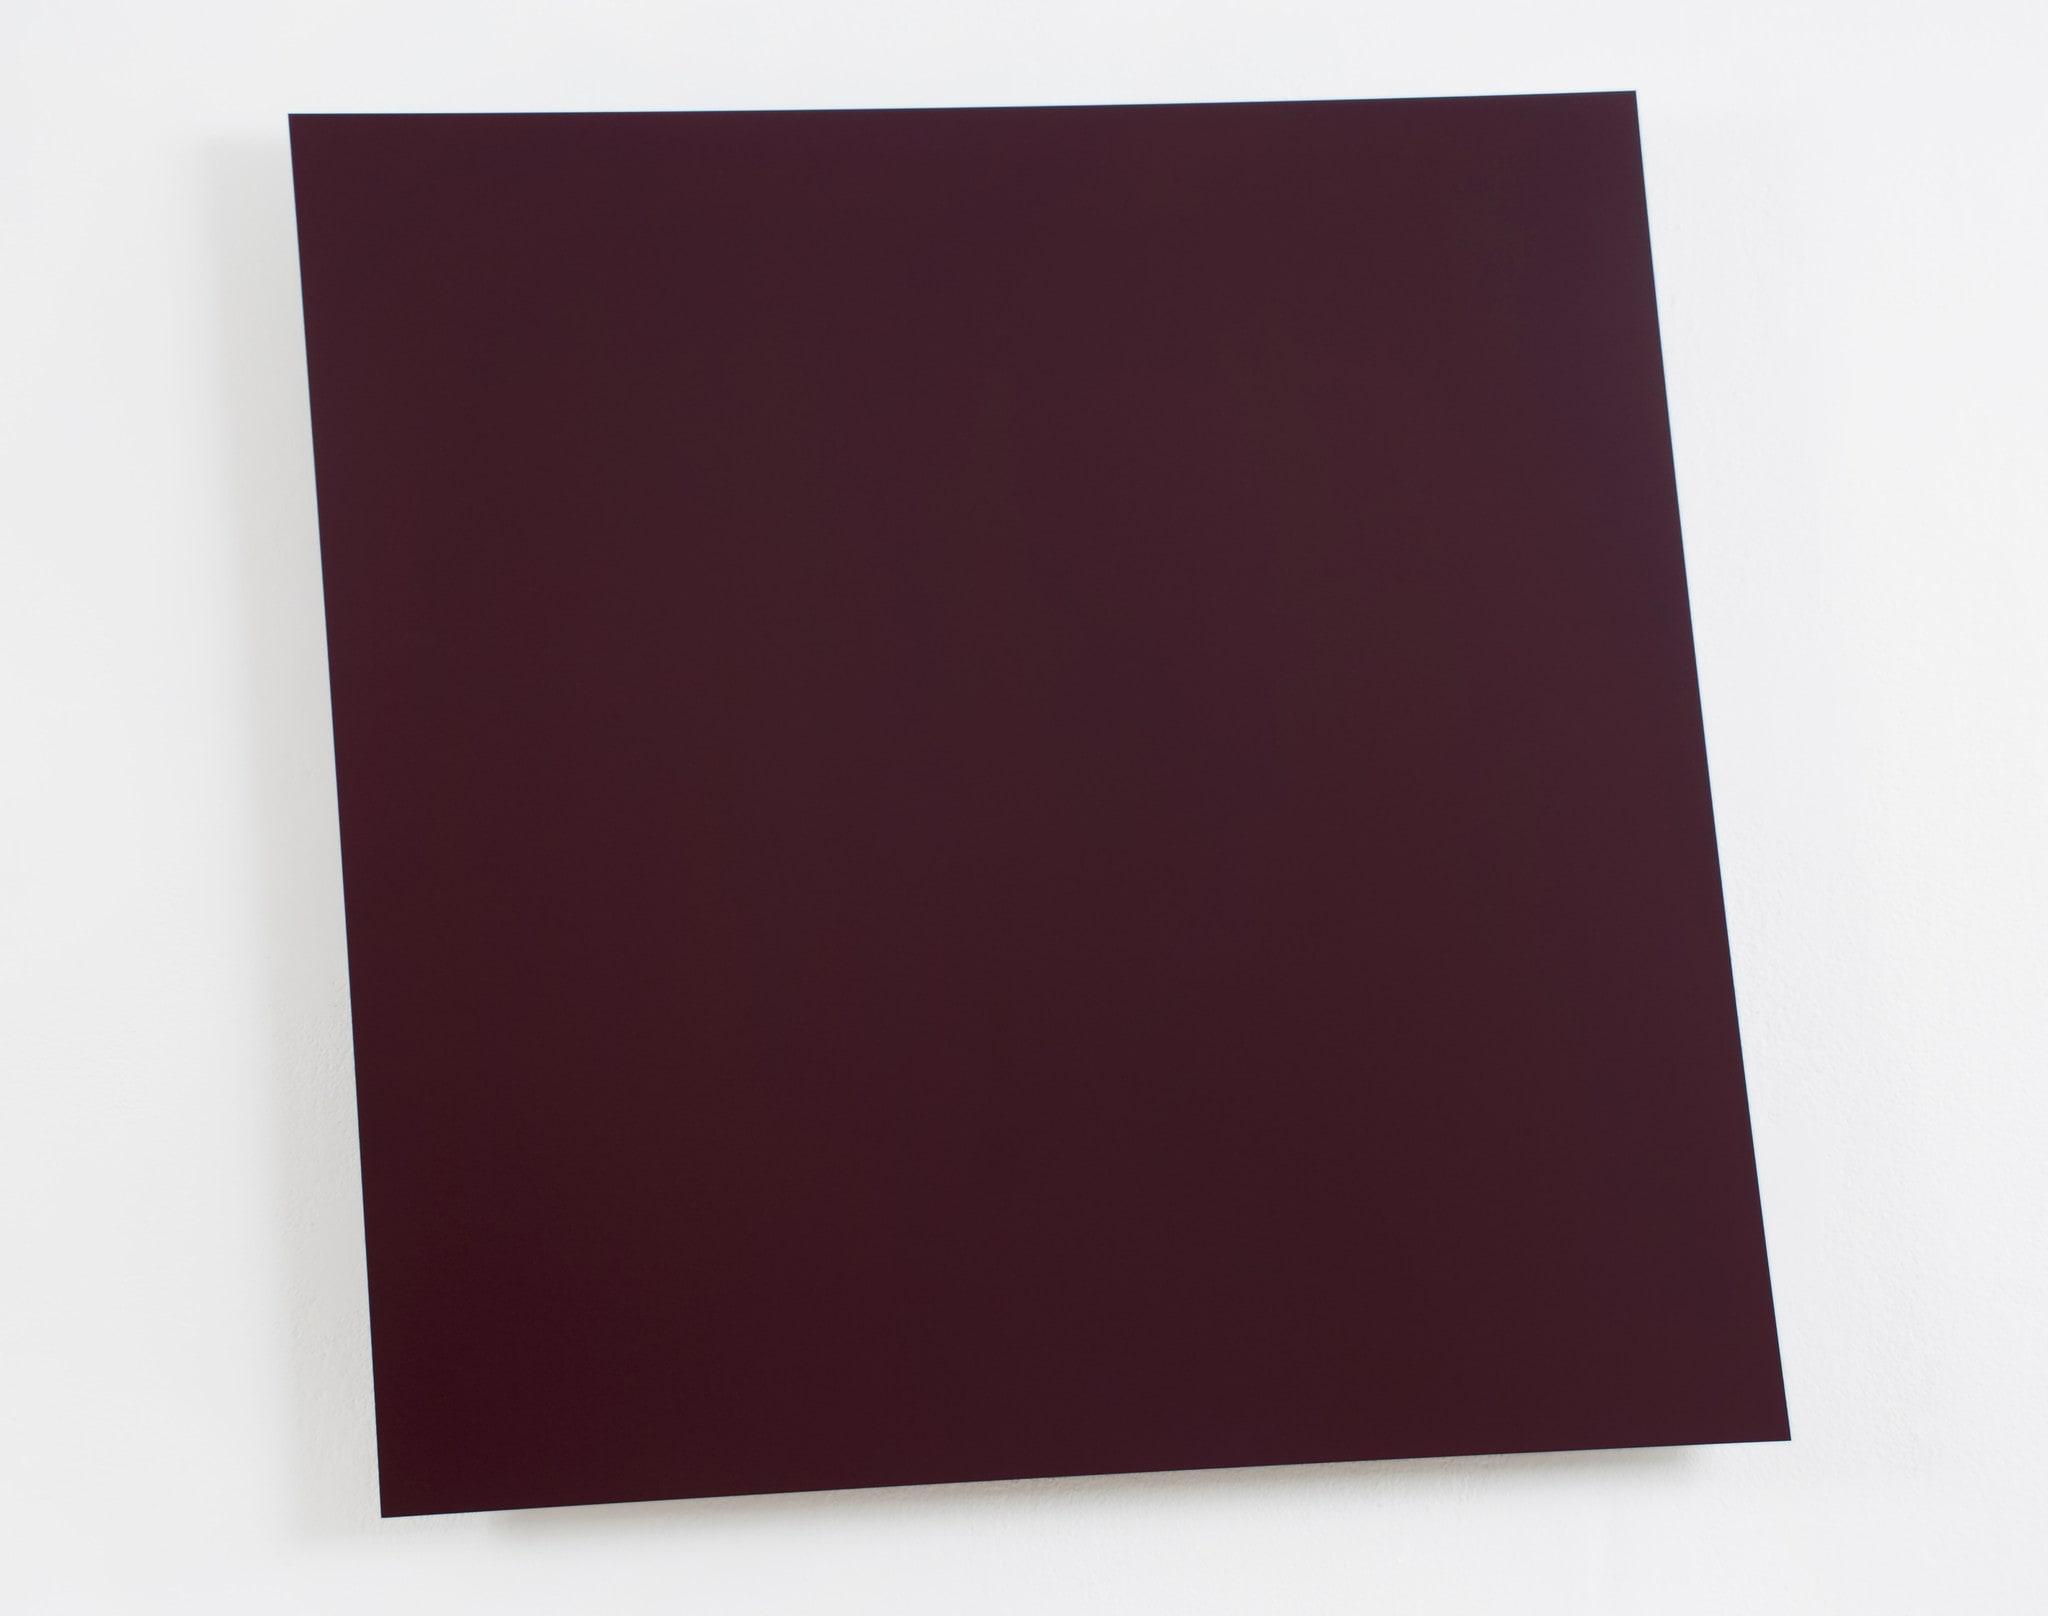 Dark Red-Violet Panel by Ellsworth Kelly